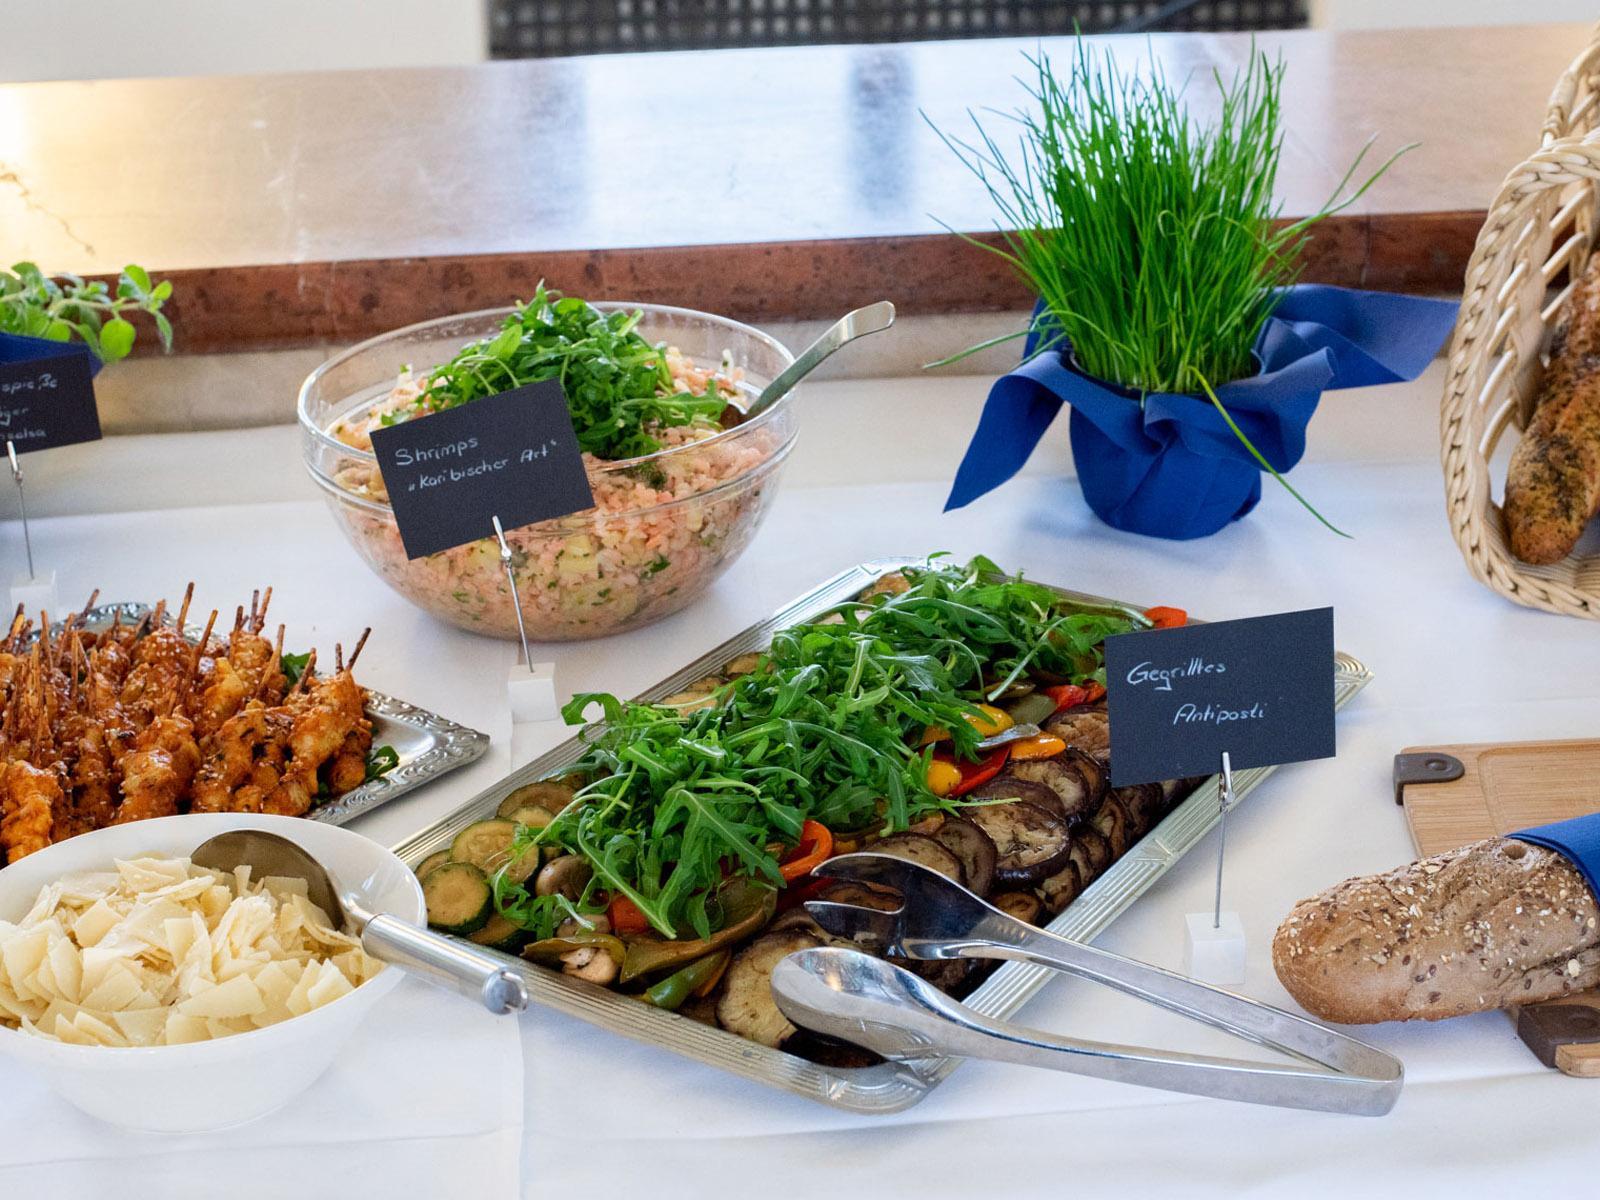 Gegrilltes Antipasti und Shrimps auf dem Buffet